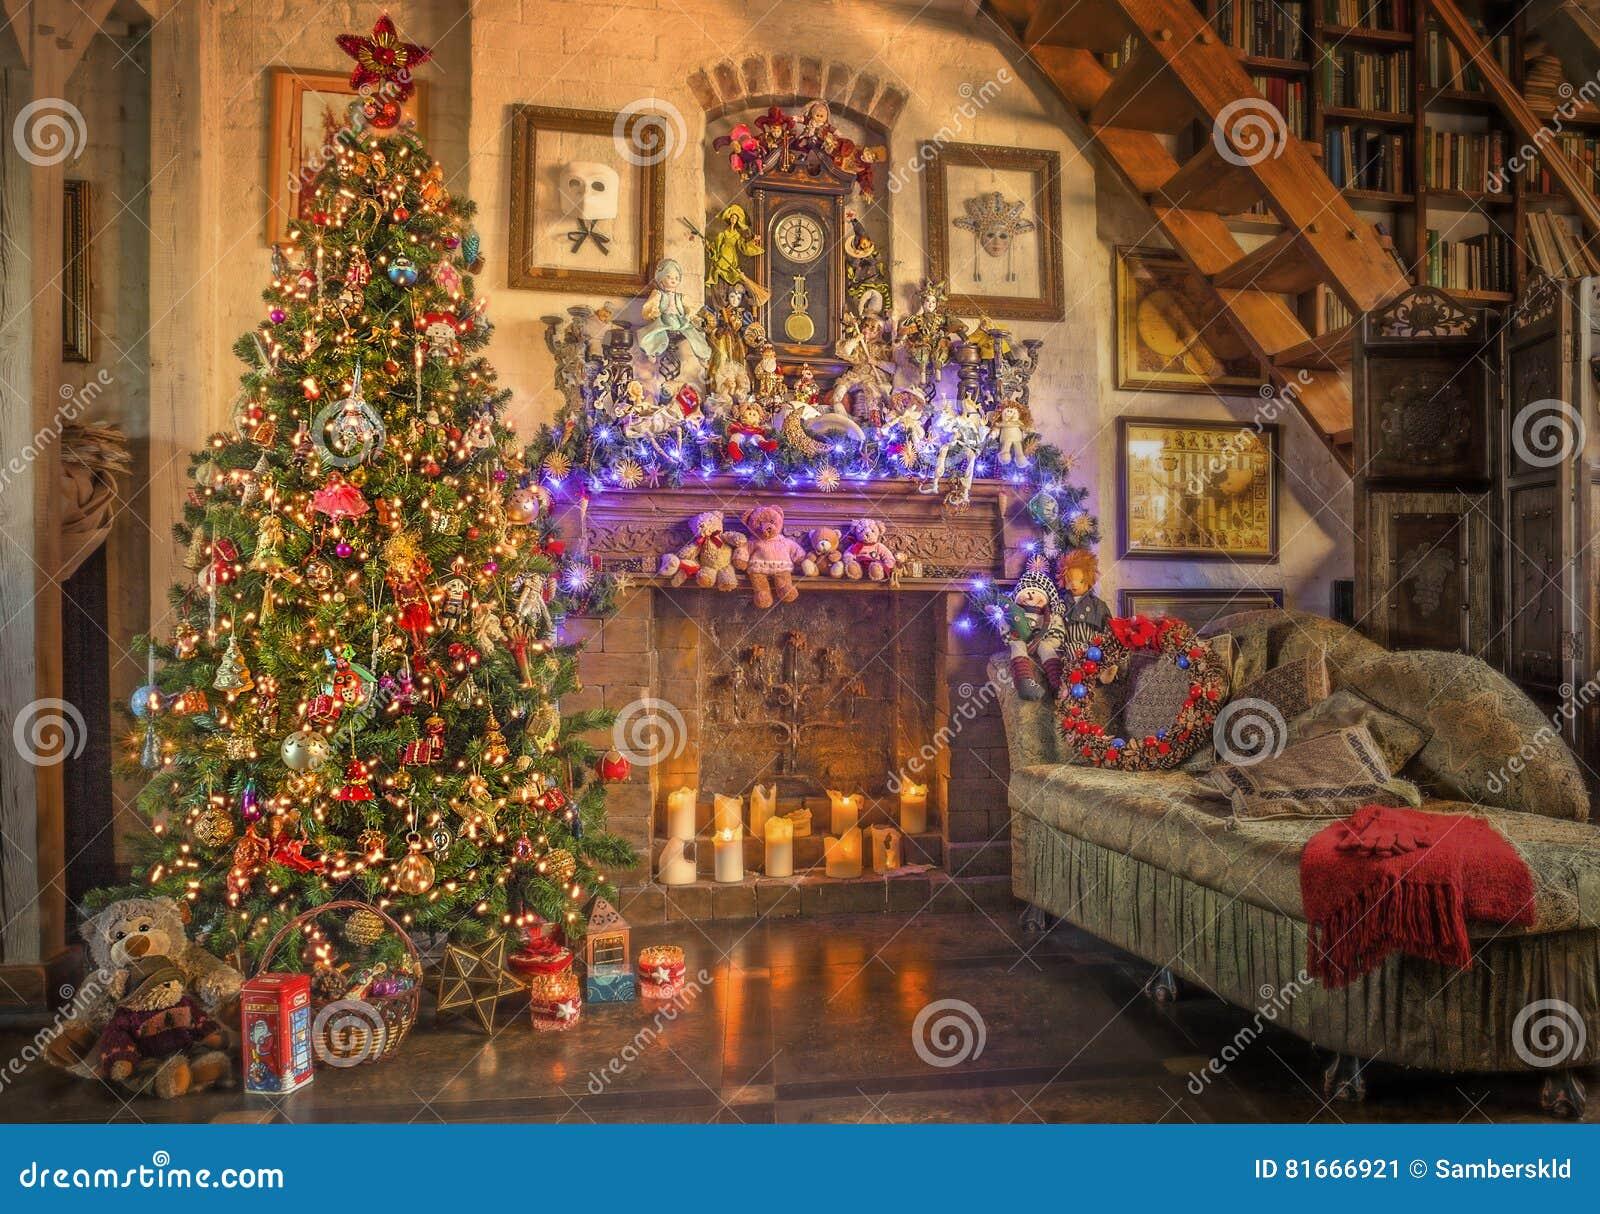 Christmas  New Year  Christmas Tree  Fireplace  001 Stock